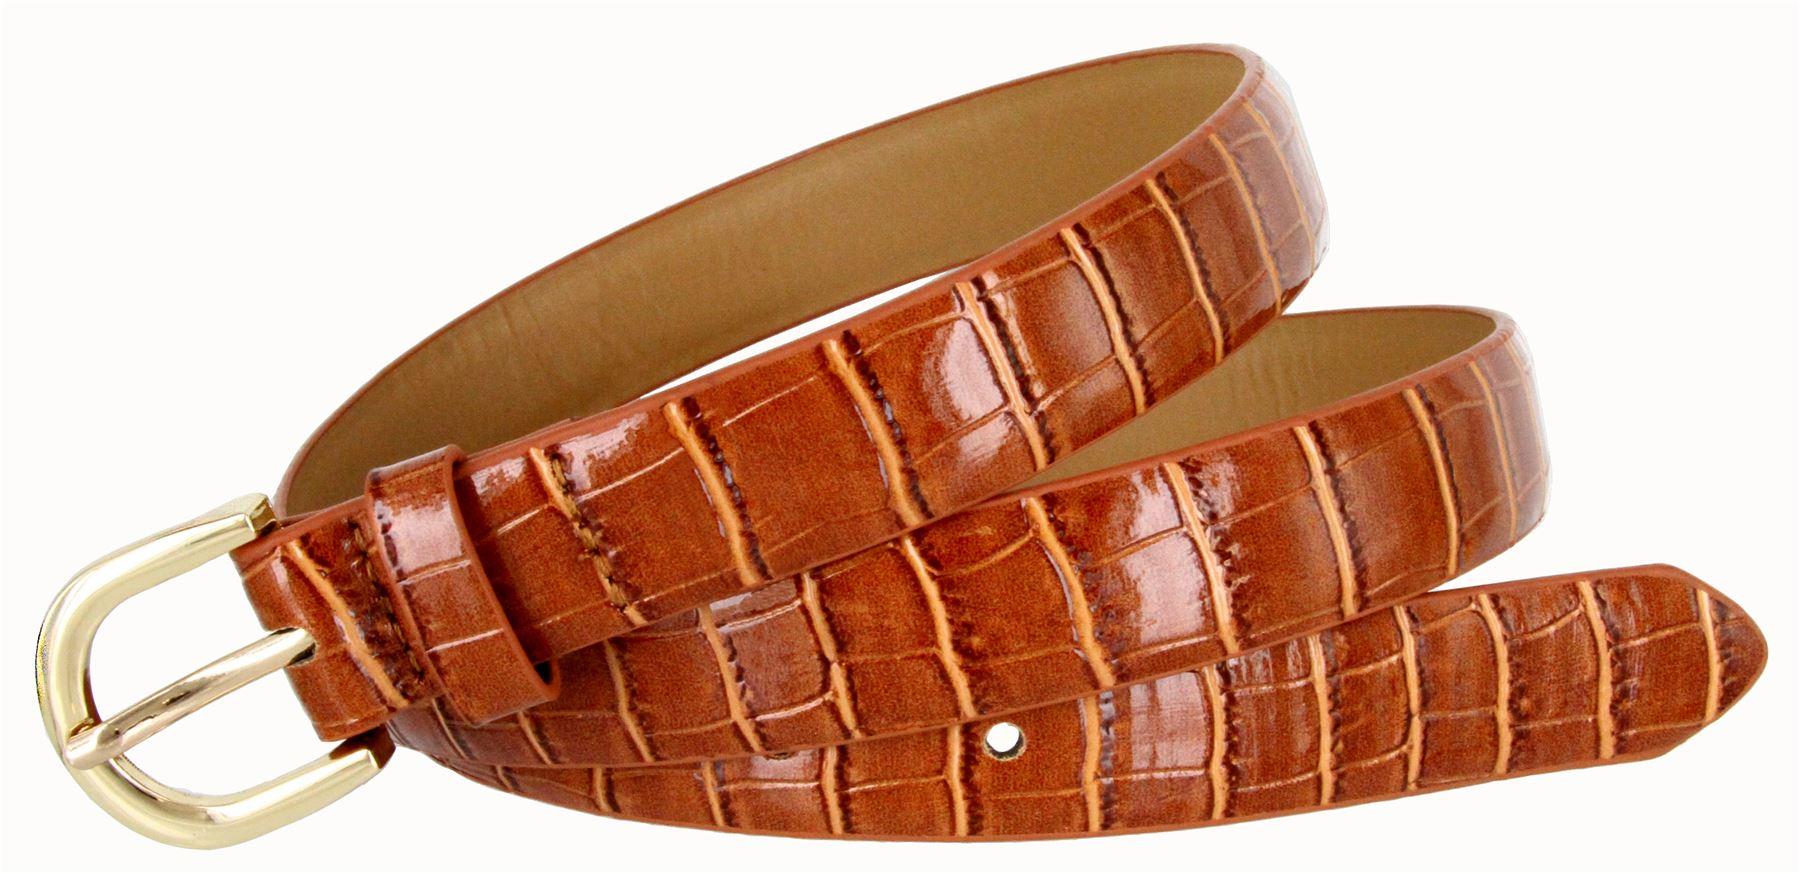 Women-039-s-Skinny-Thin-Alligator-Embossed-Genuine-Leather-Belt-1-034-25mm-Wide thumbnail 21